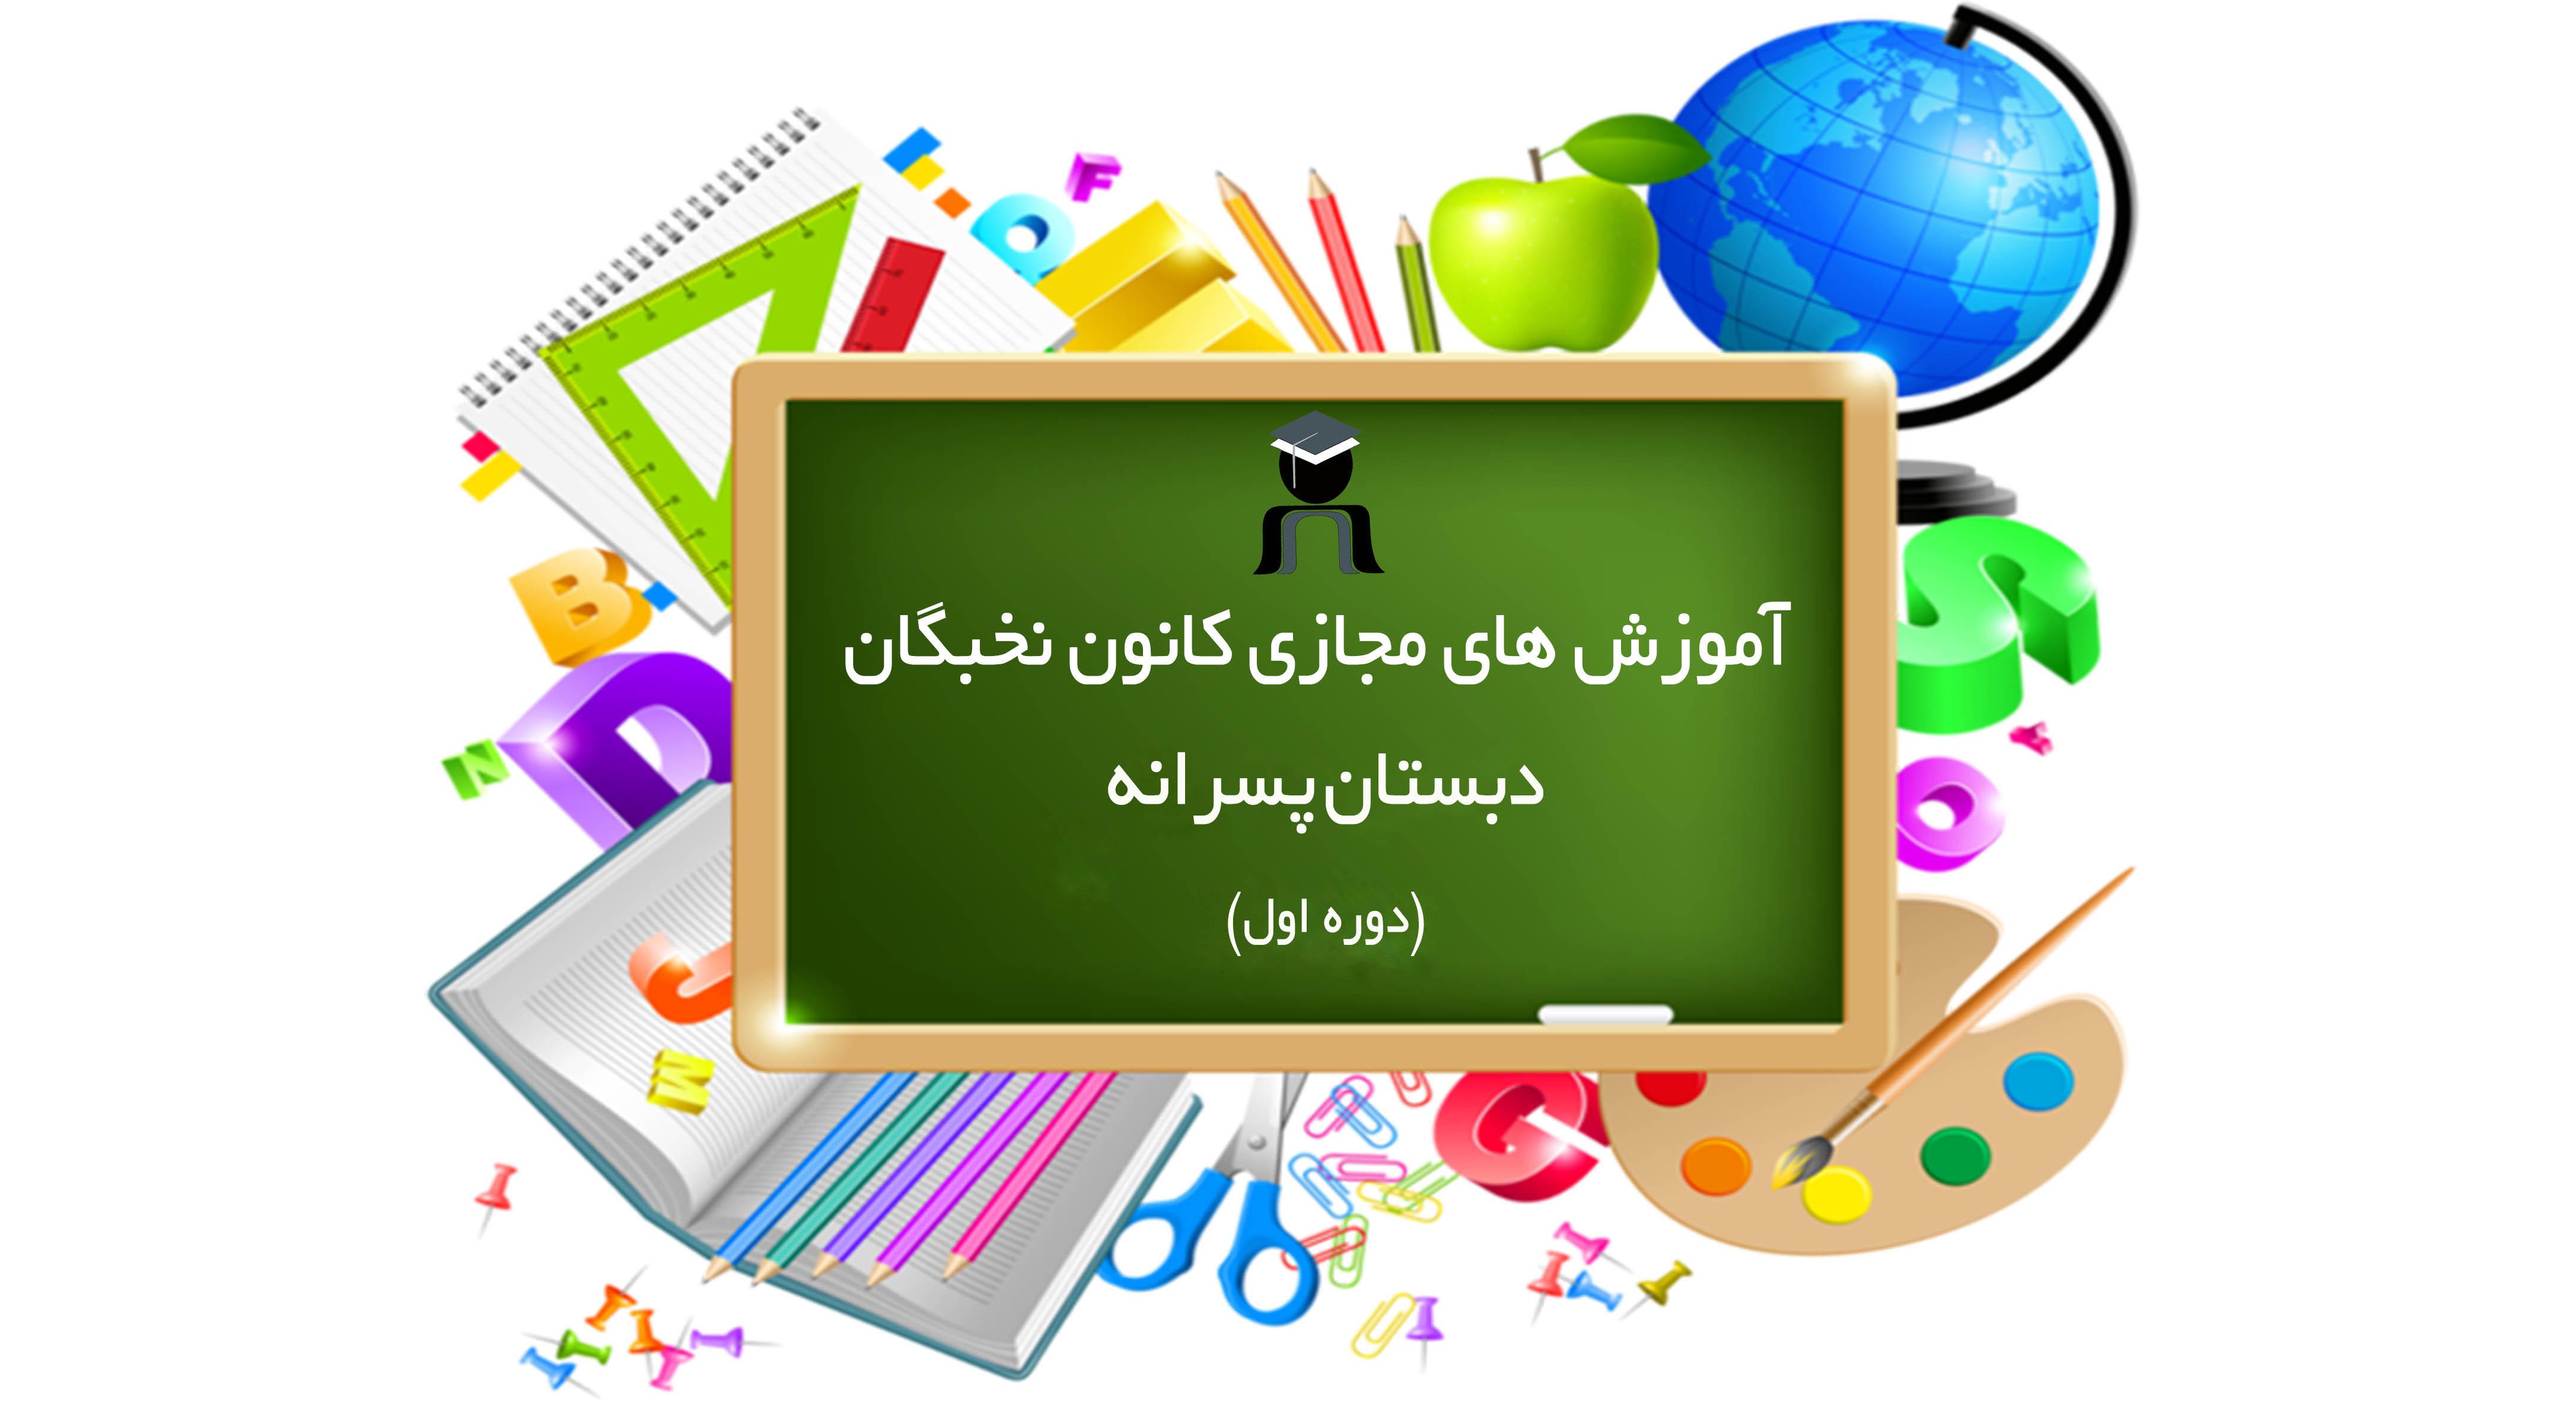 کلاس های تابستانه پایه دوم 3 ( خانم رضاپور)